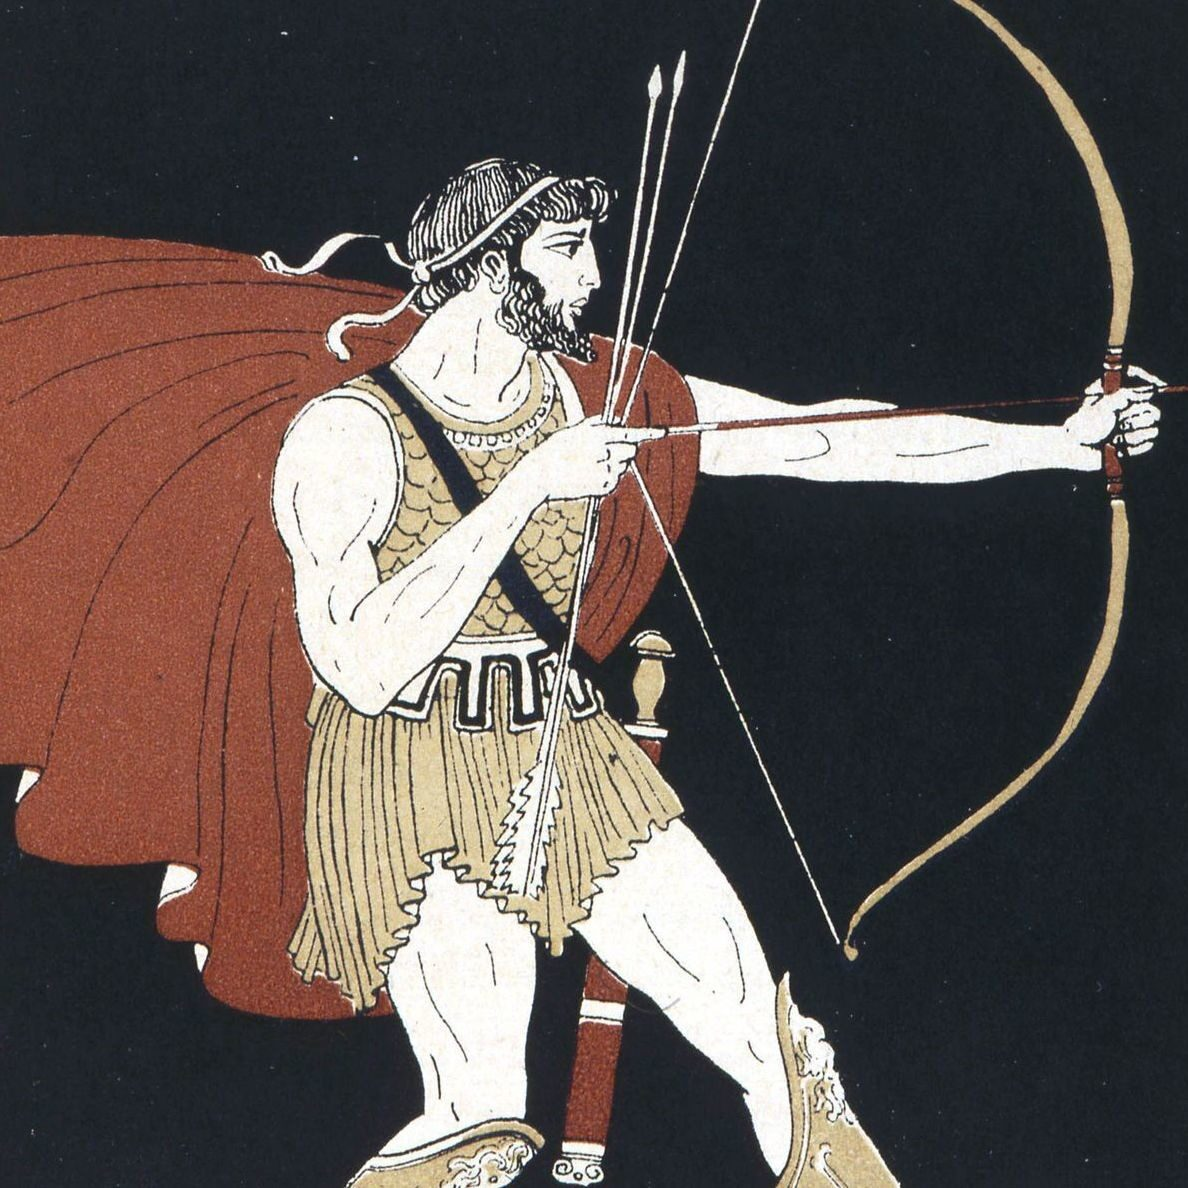 Ulysse-courbe-eclatant-terrible-illustration-1914-Andre-Bonamy_1_1188_1188.jpg